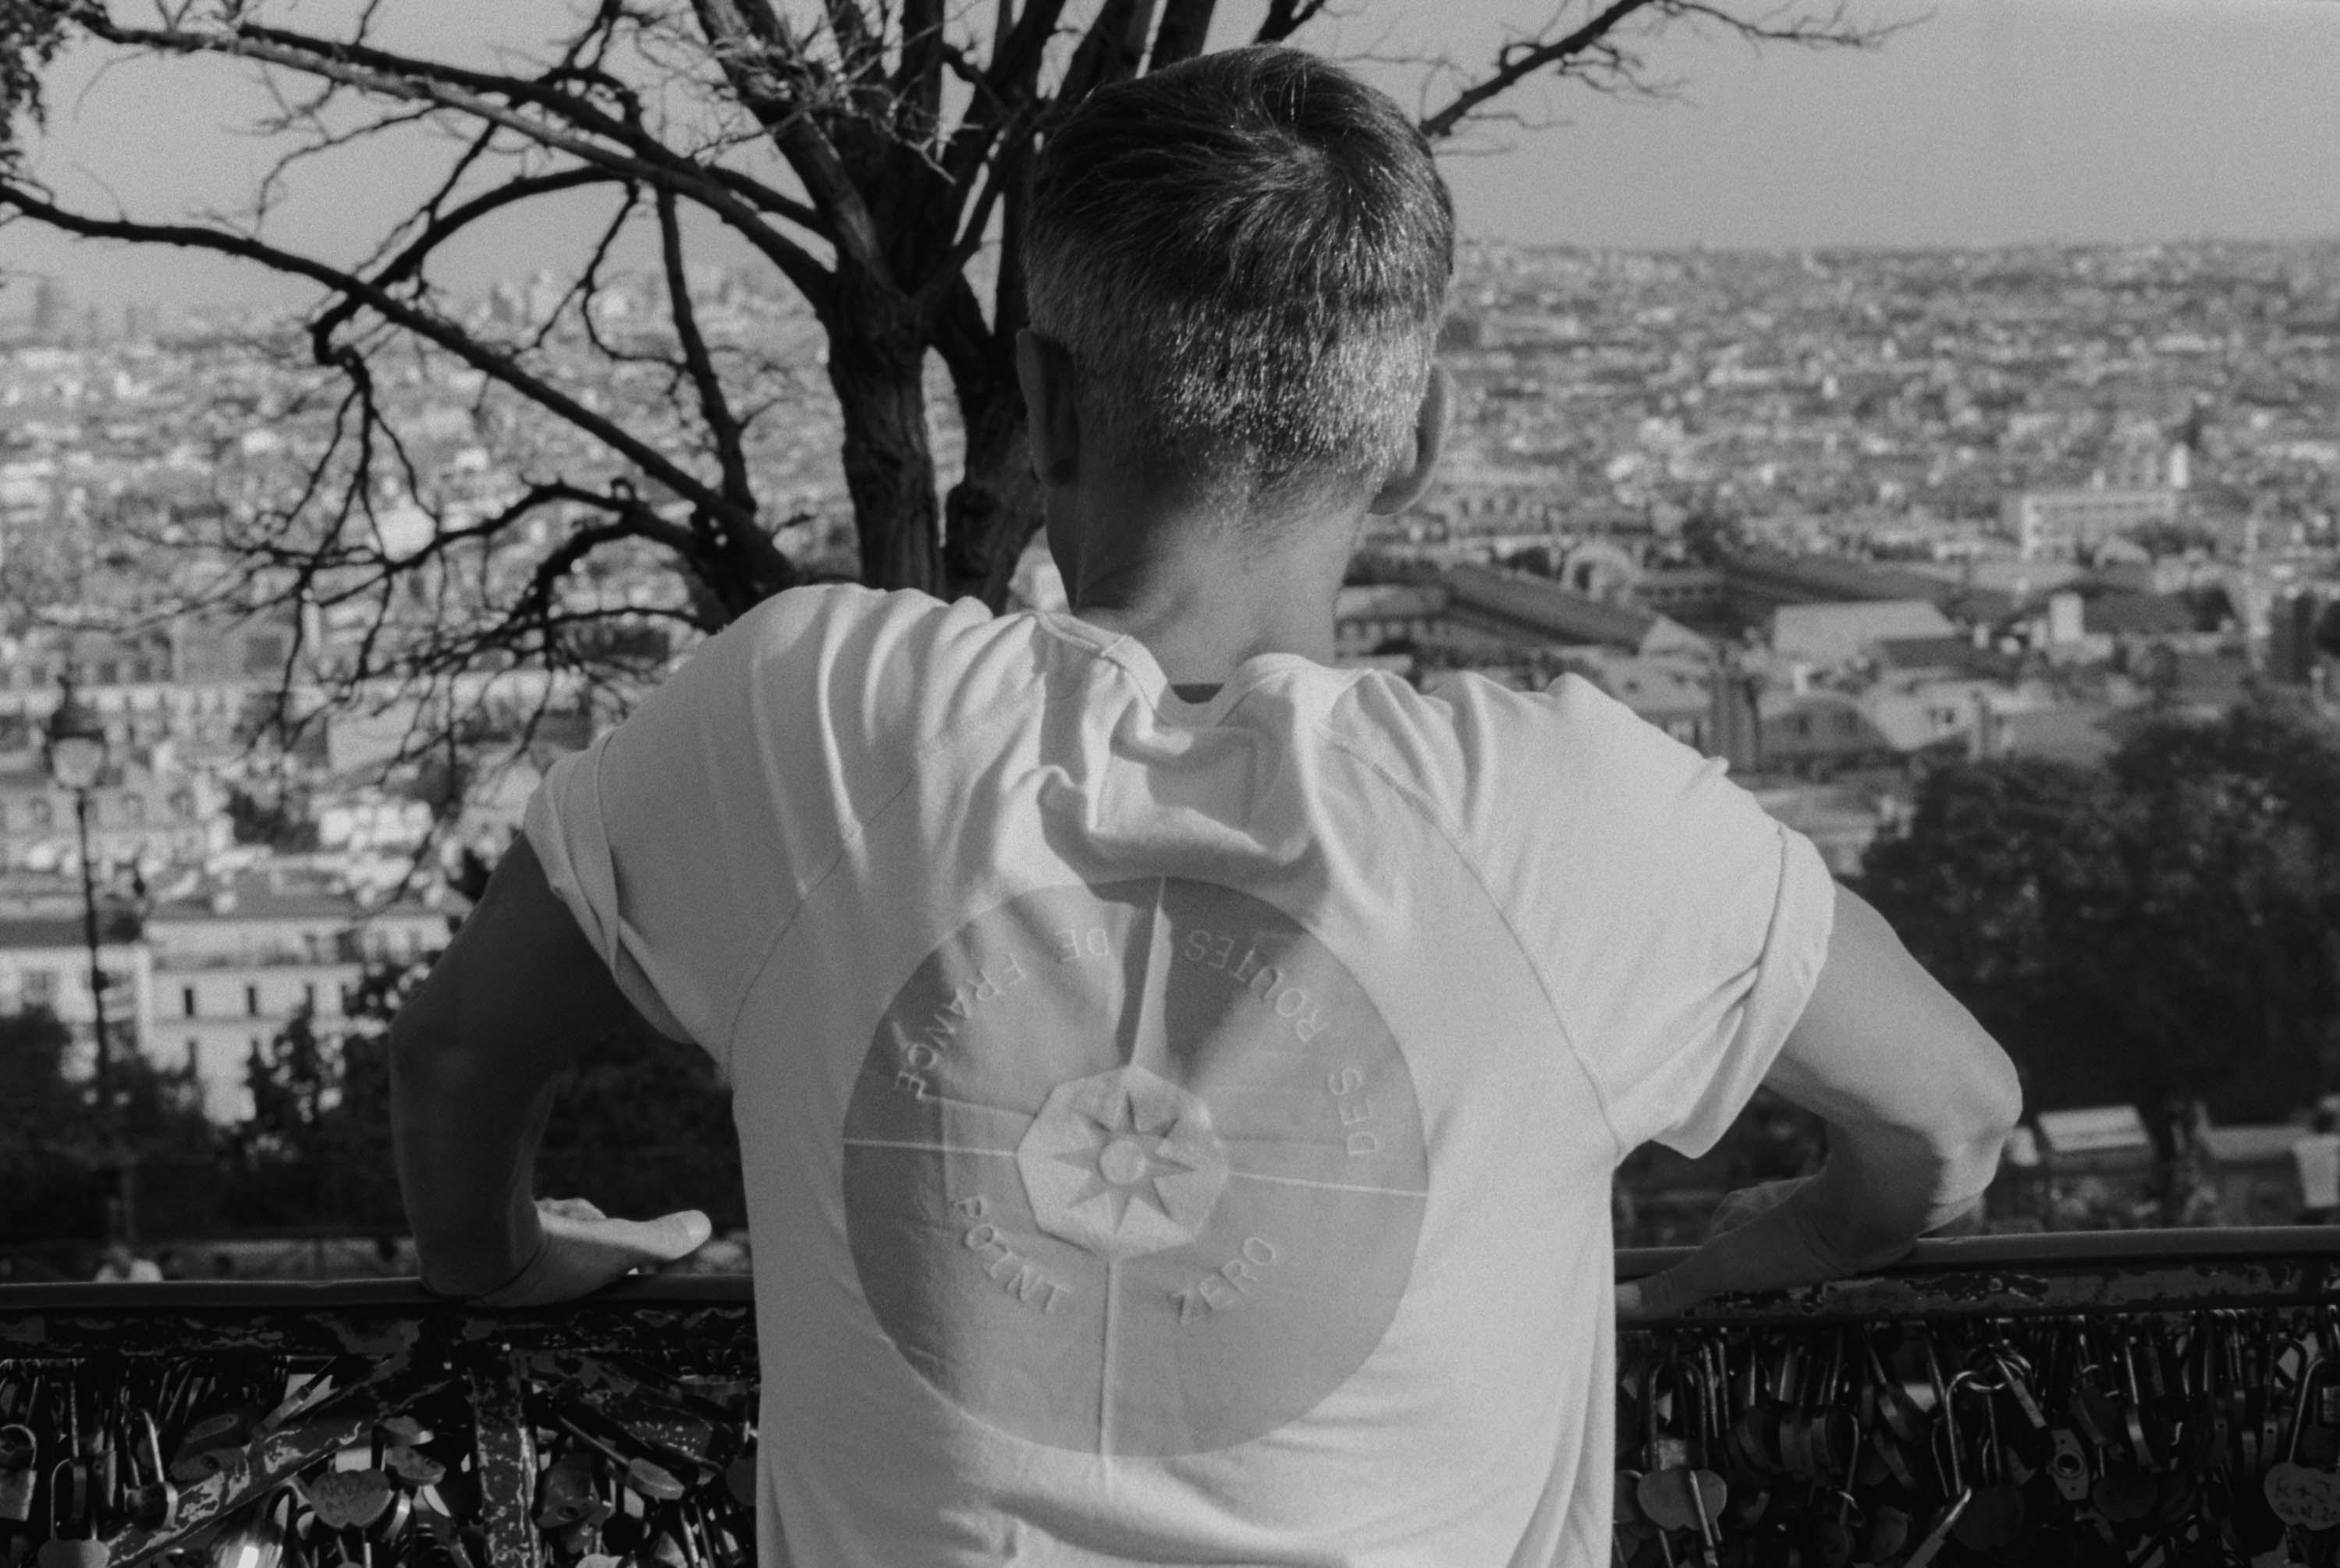 REIGNING CHAMP × ASICS、パリに着想したカプセルコレクション発売